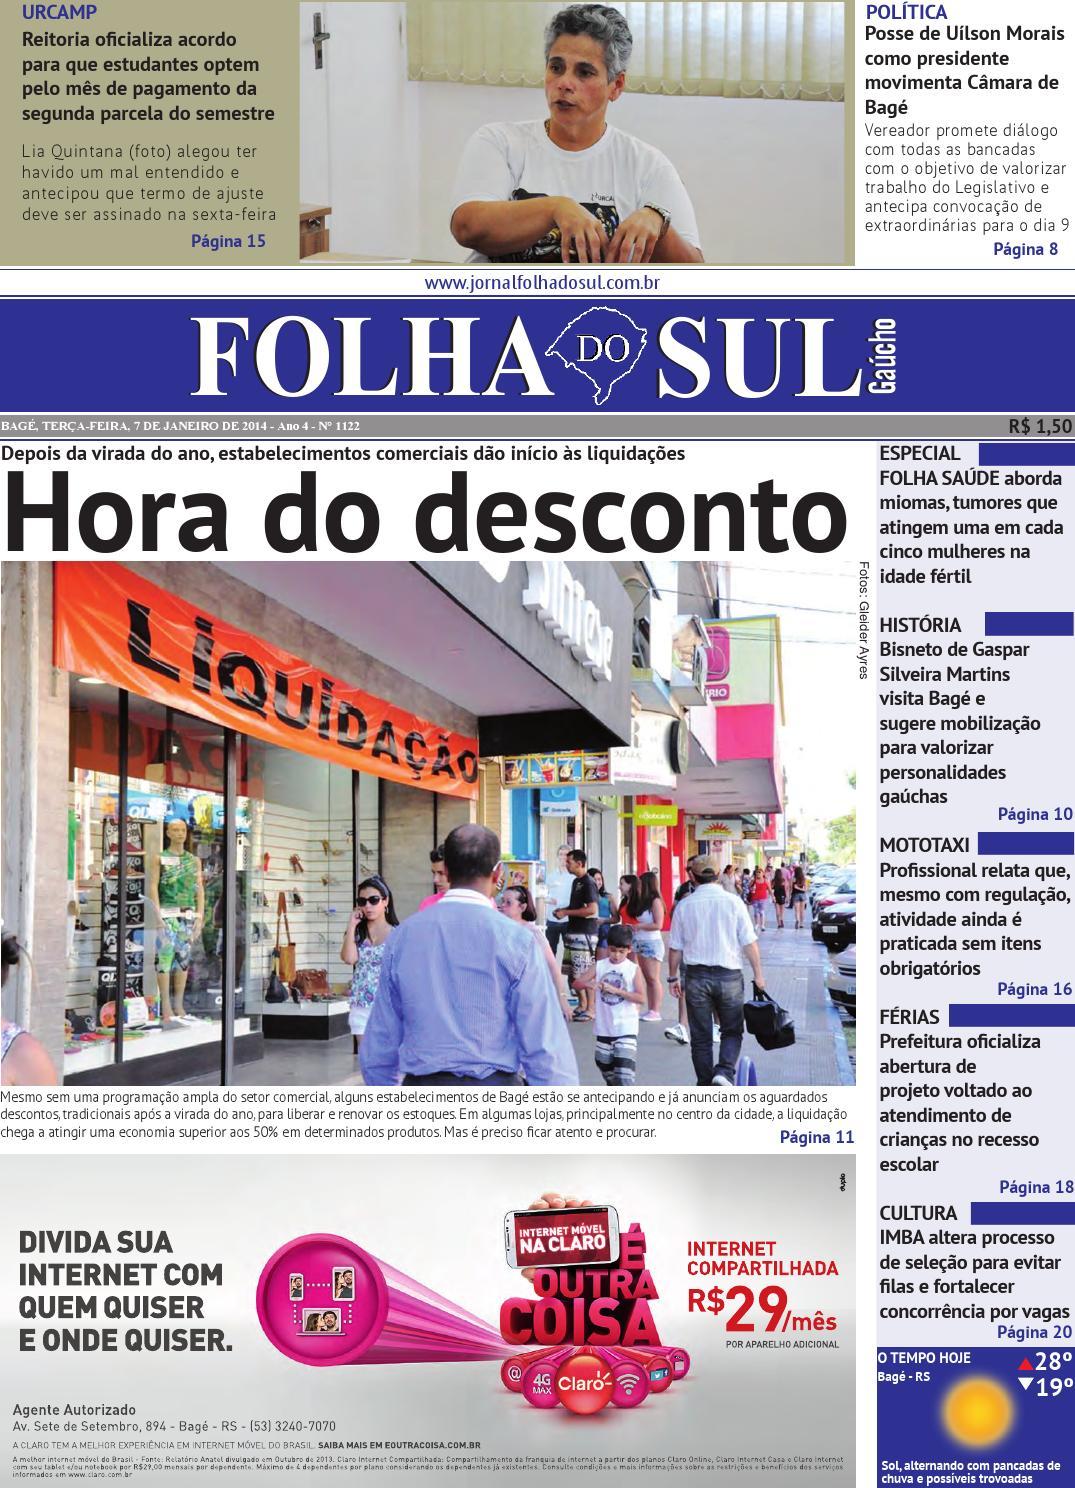 66e08a2d3 Folha do Sul Gaúcho Ed. 1122 (07 01 2014) by Folha do Sul Gaúcho - issuu